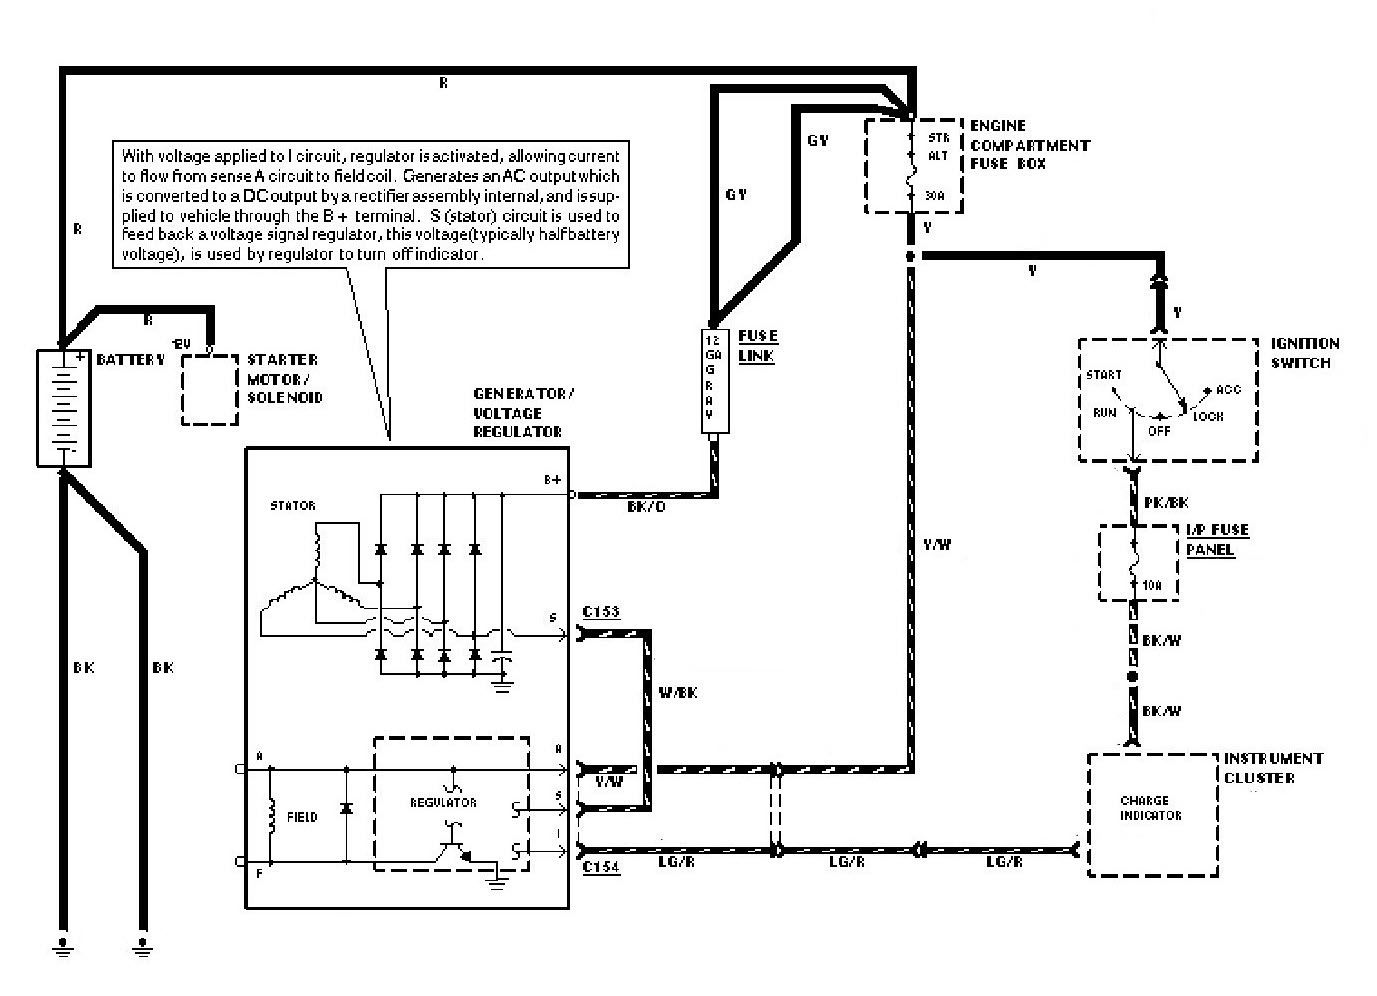 alternator internal wiring diagram 7 3 liter diesel engine regulator